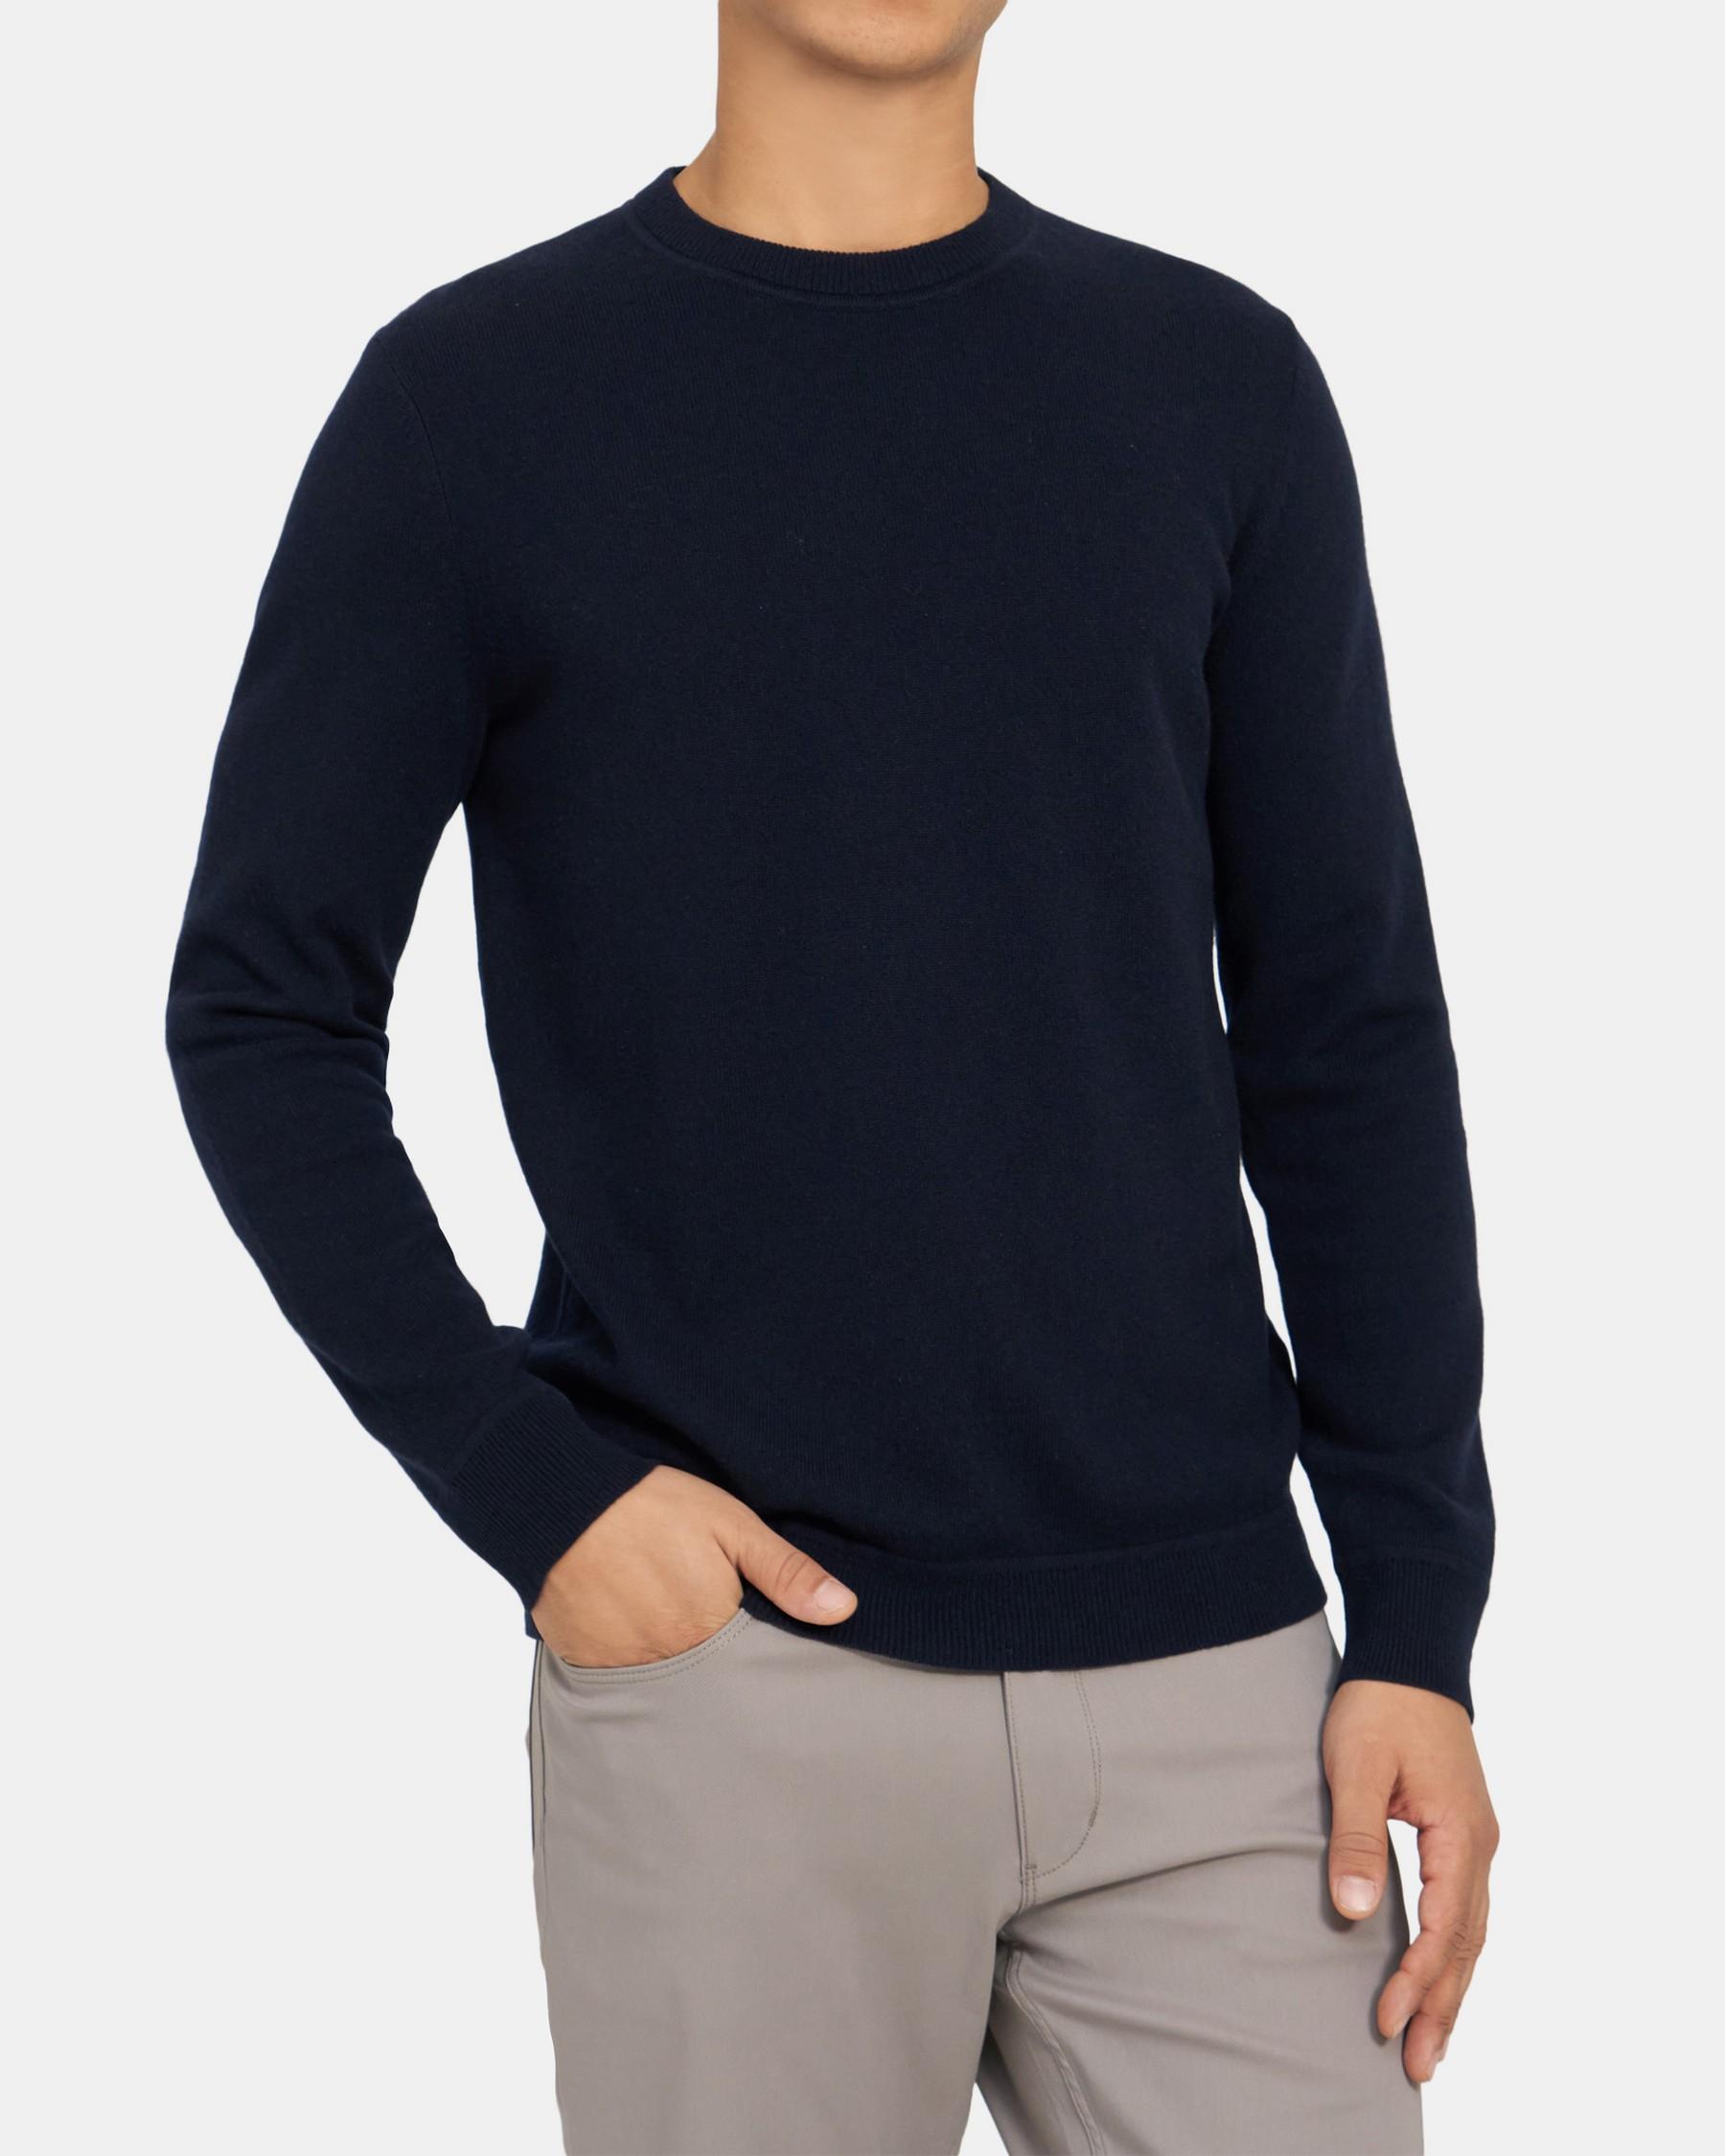 Theory Crewneck Sweatshirt in Cashmere